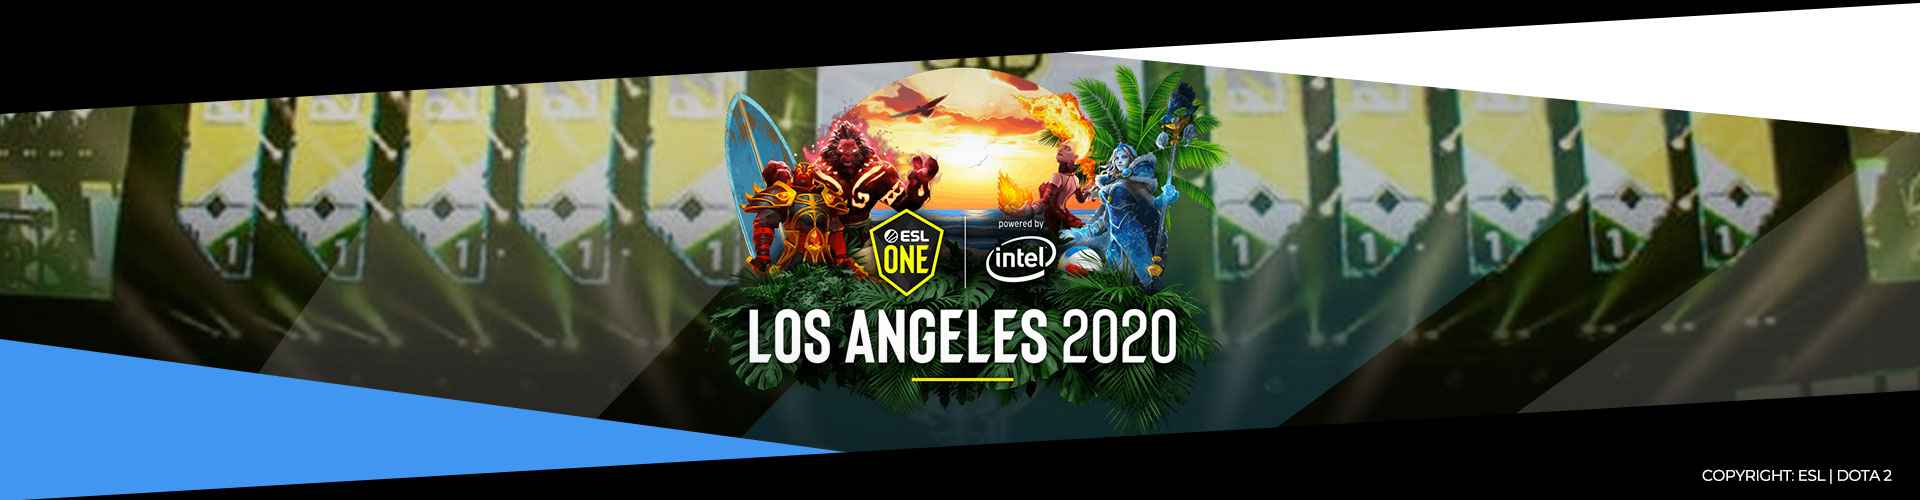 Eventsida för ESL One Los Angeles.